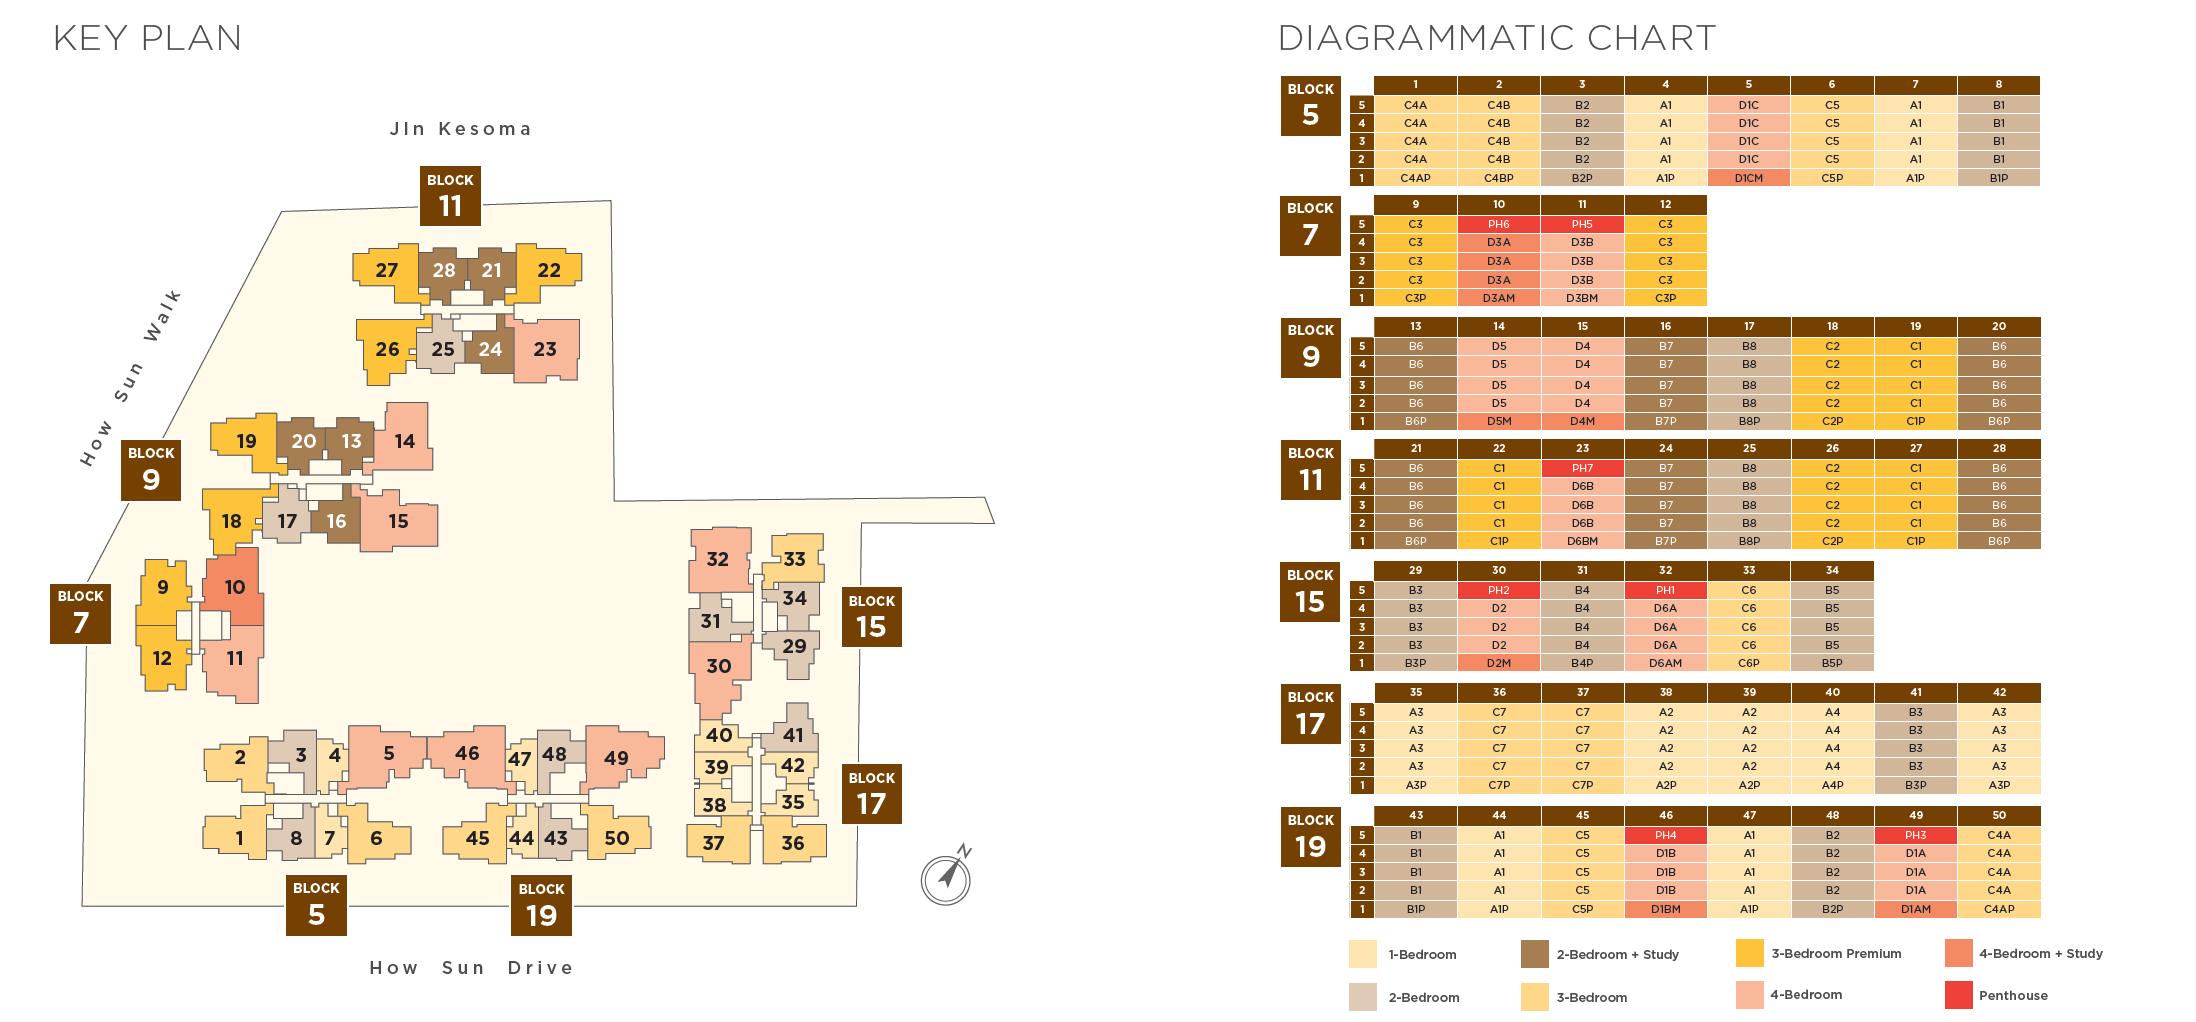 The Gazania key plan and diagrammatic chart